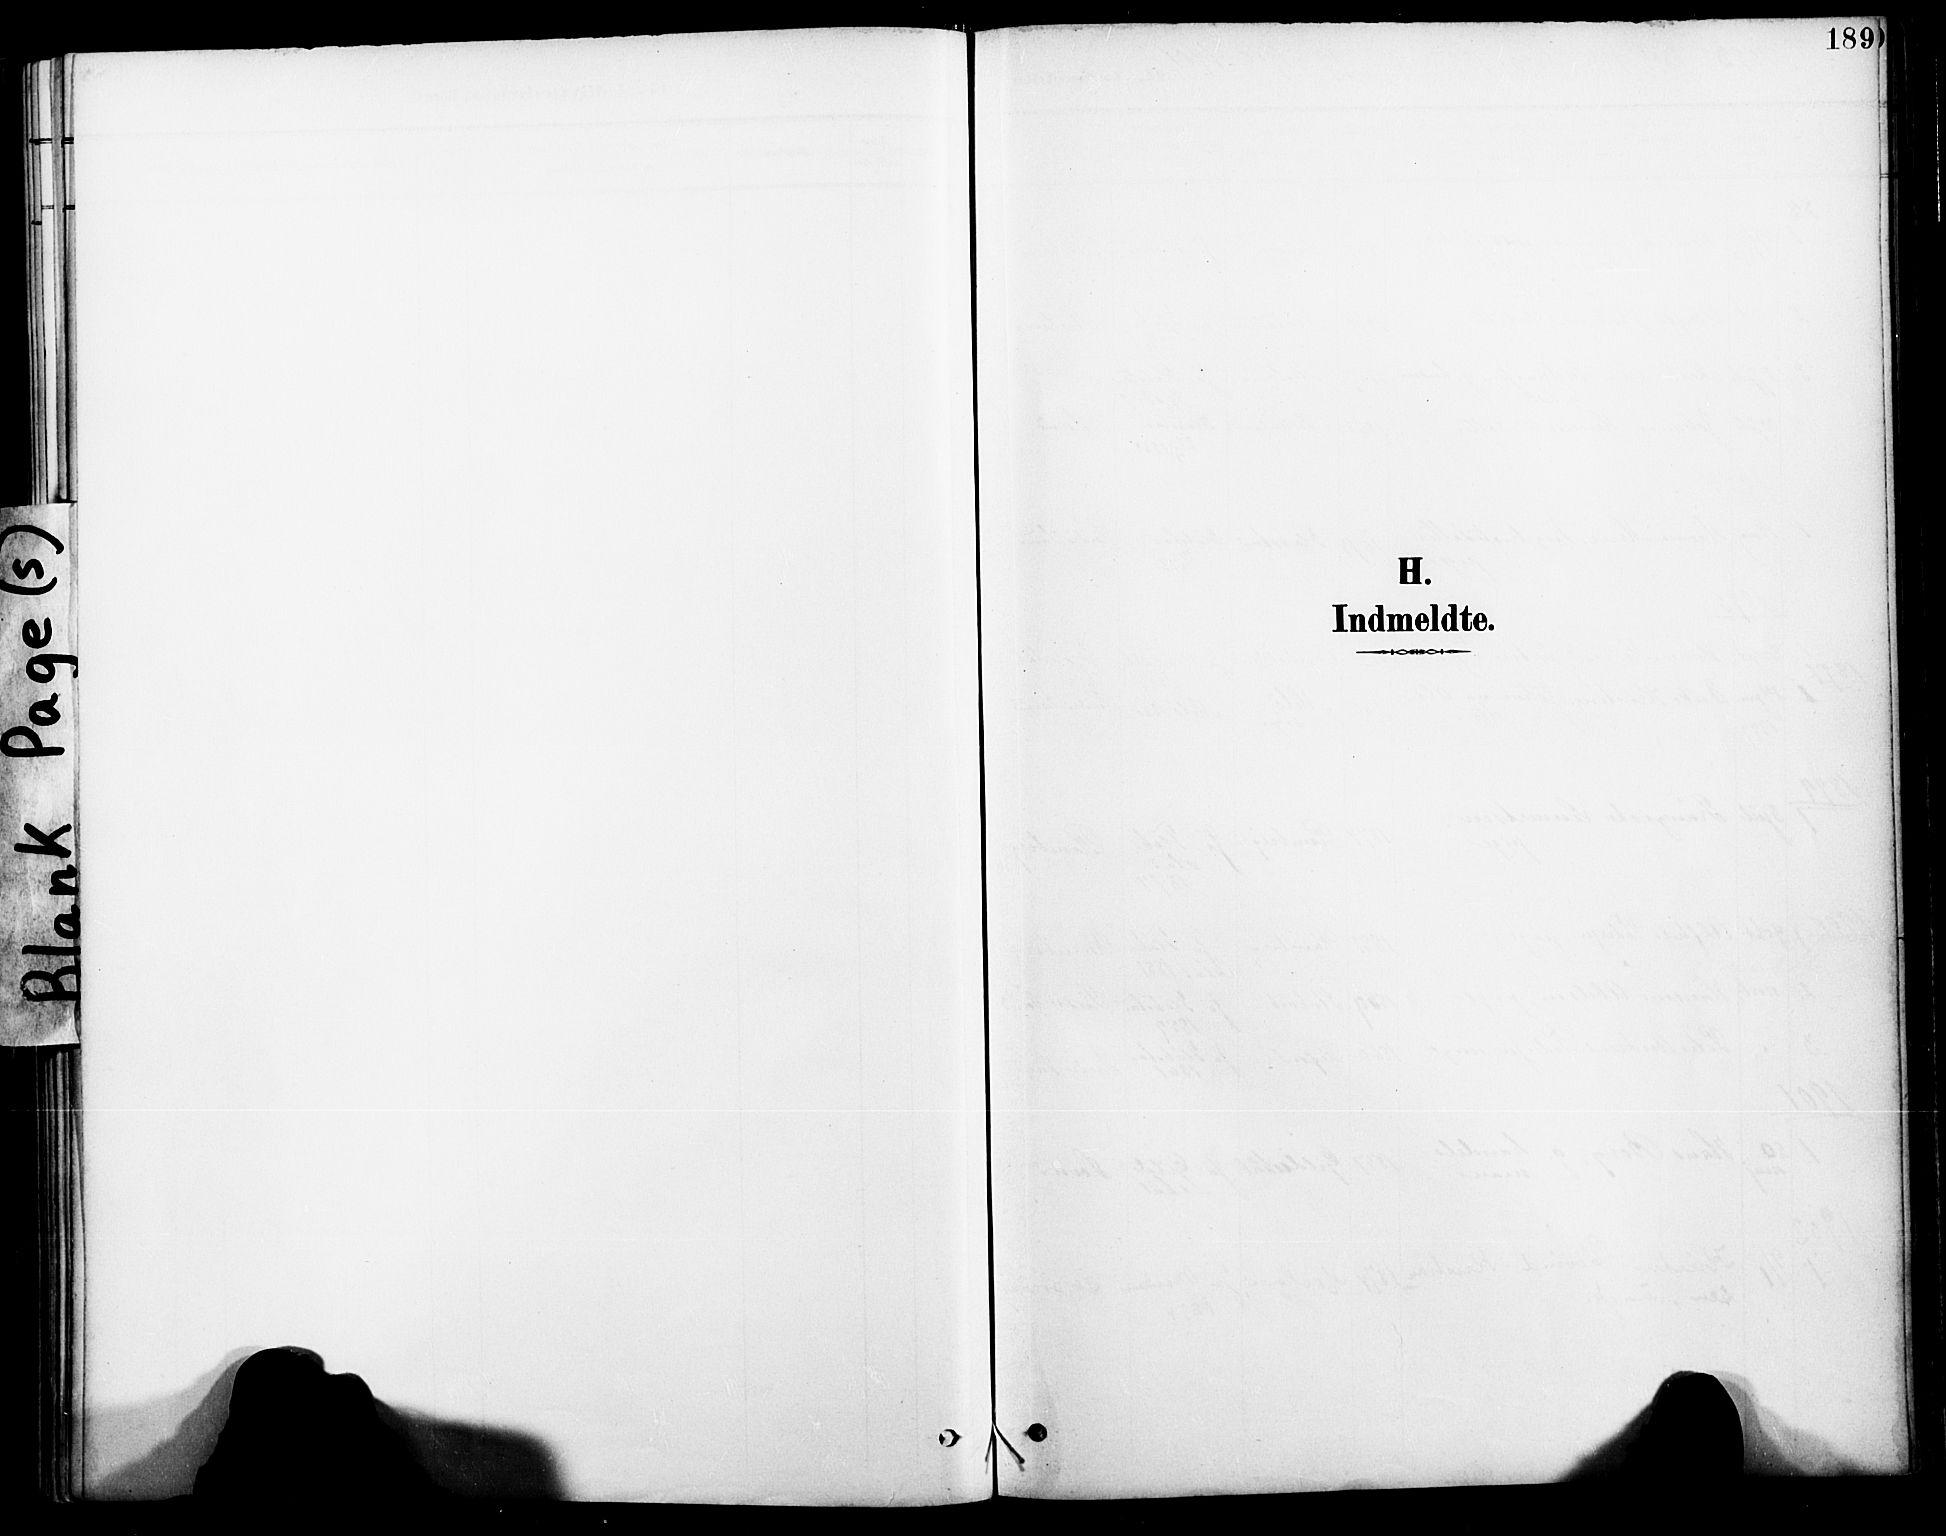 SAT, Ministerialprotokoller, klokkerbøker og fødselsregistre - Nordland, 885/L1205: Ministerialbok nr. 885A06, 1892-1905, s. 189